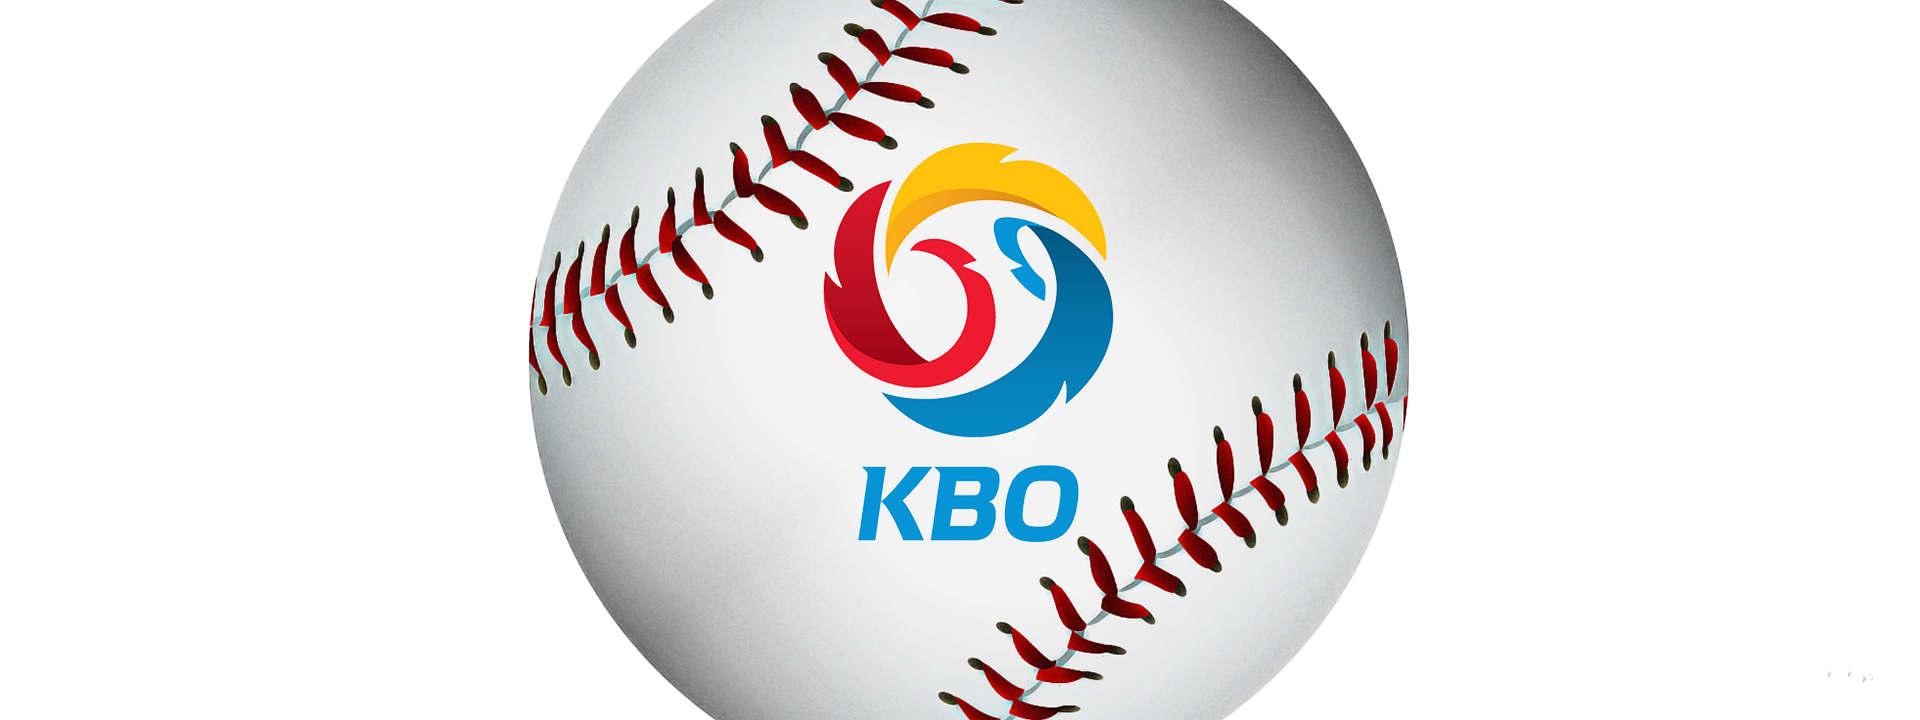 KBO_썸네일.jpg